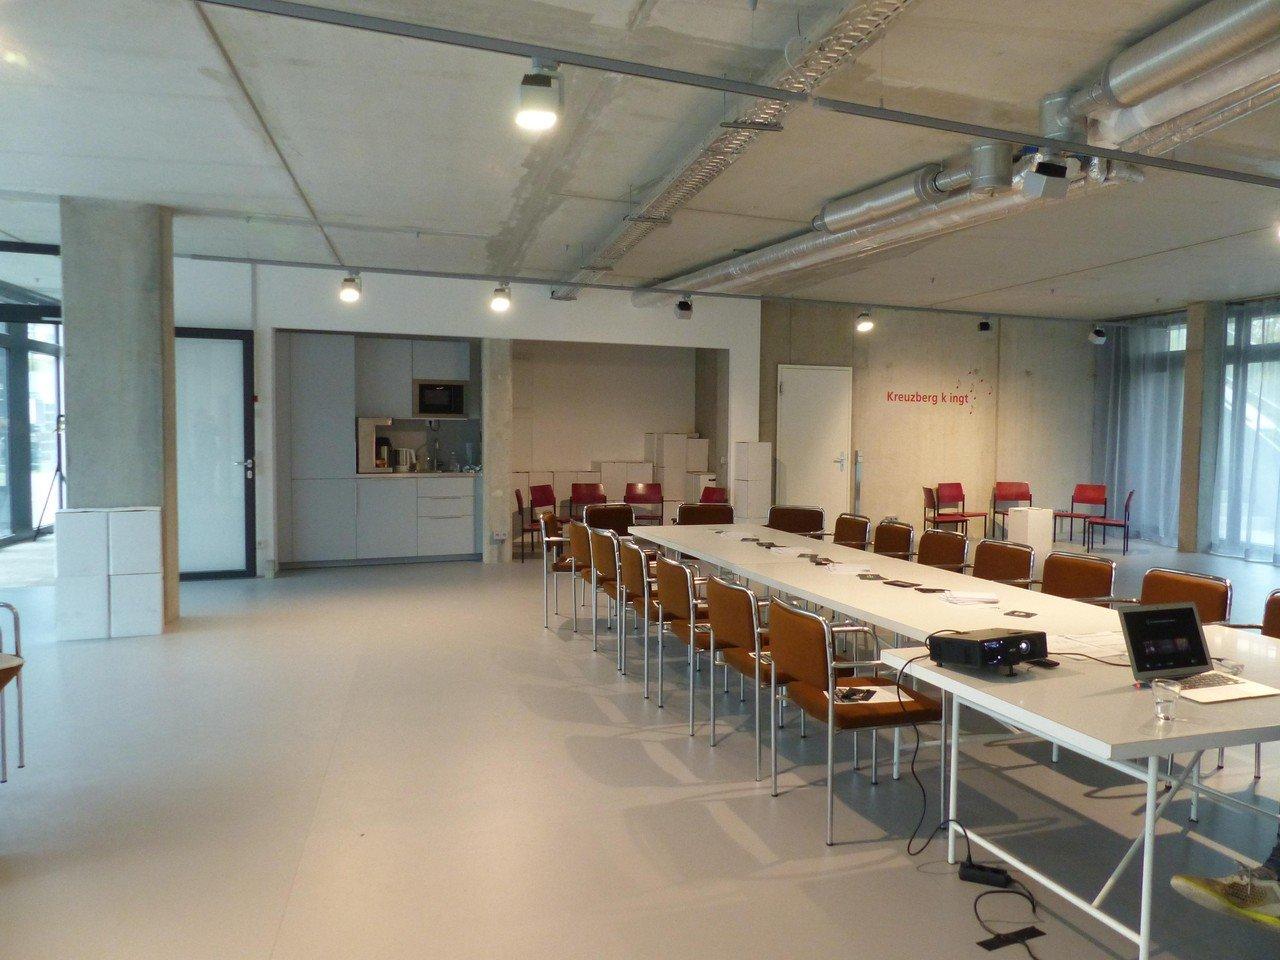 Berlin training rooms Lieu industriel Space P2 image 0